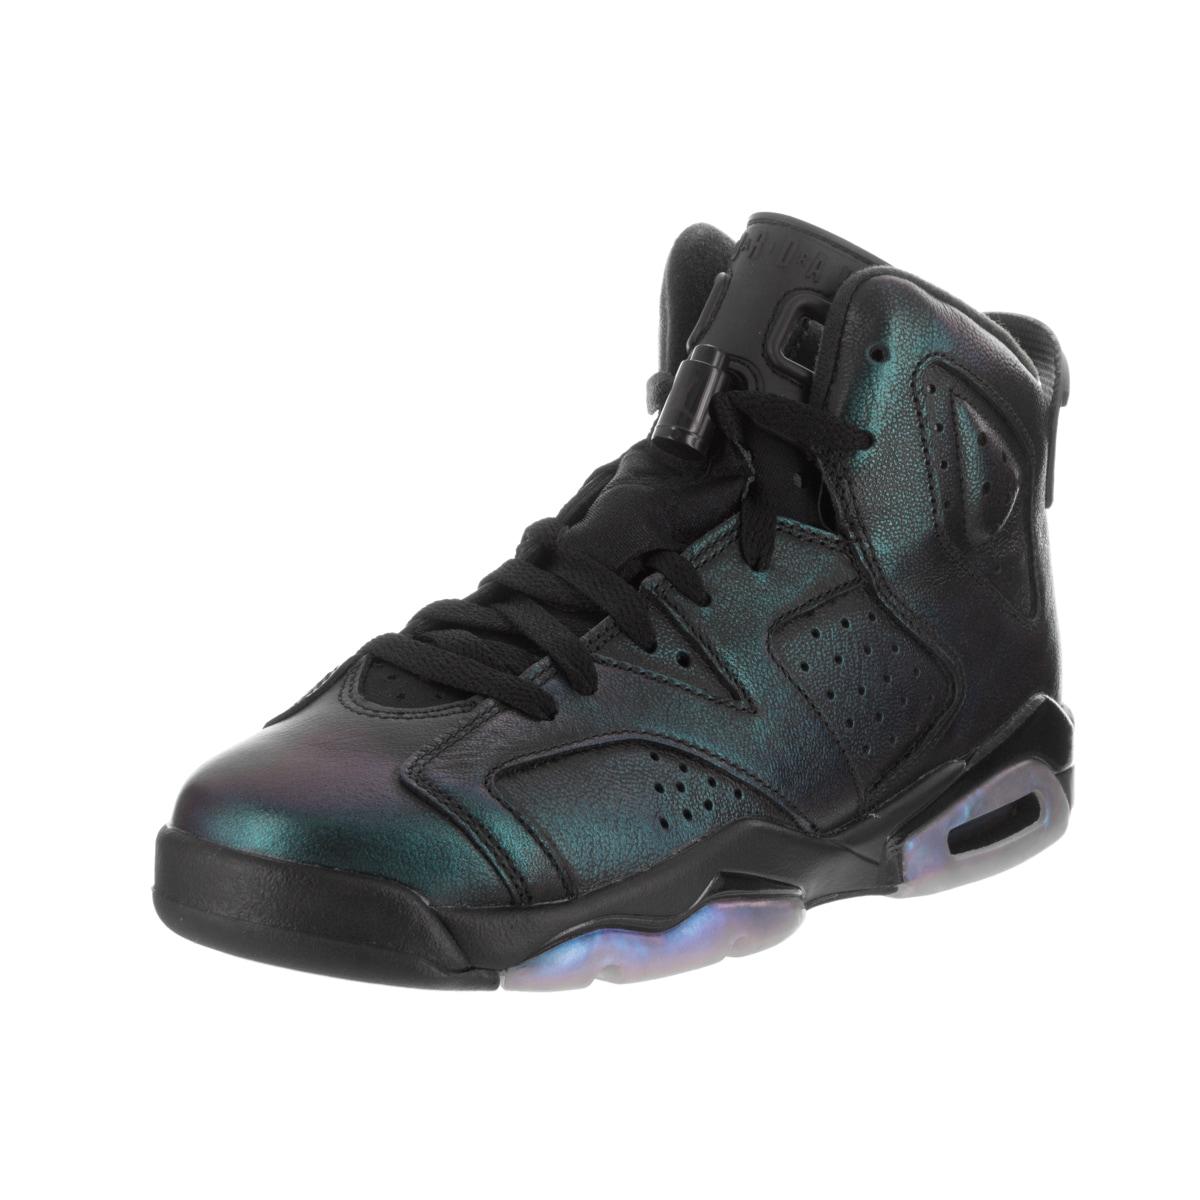 Nike Kids Air Jordan 6 Retro AS BG Basketball Shoe (5), Boy's, Black (leather)